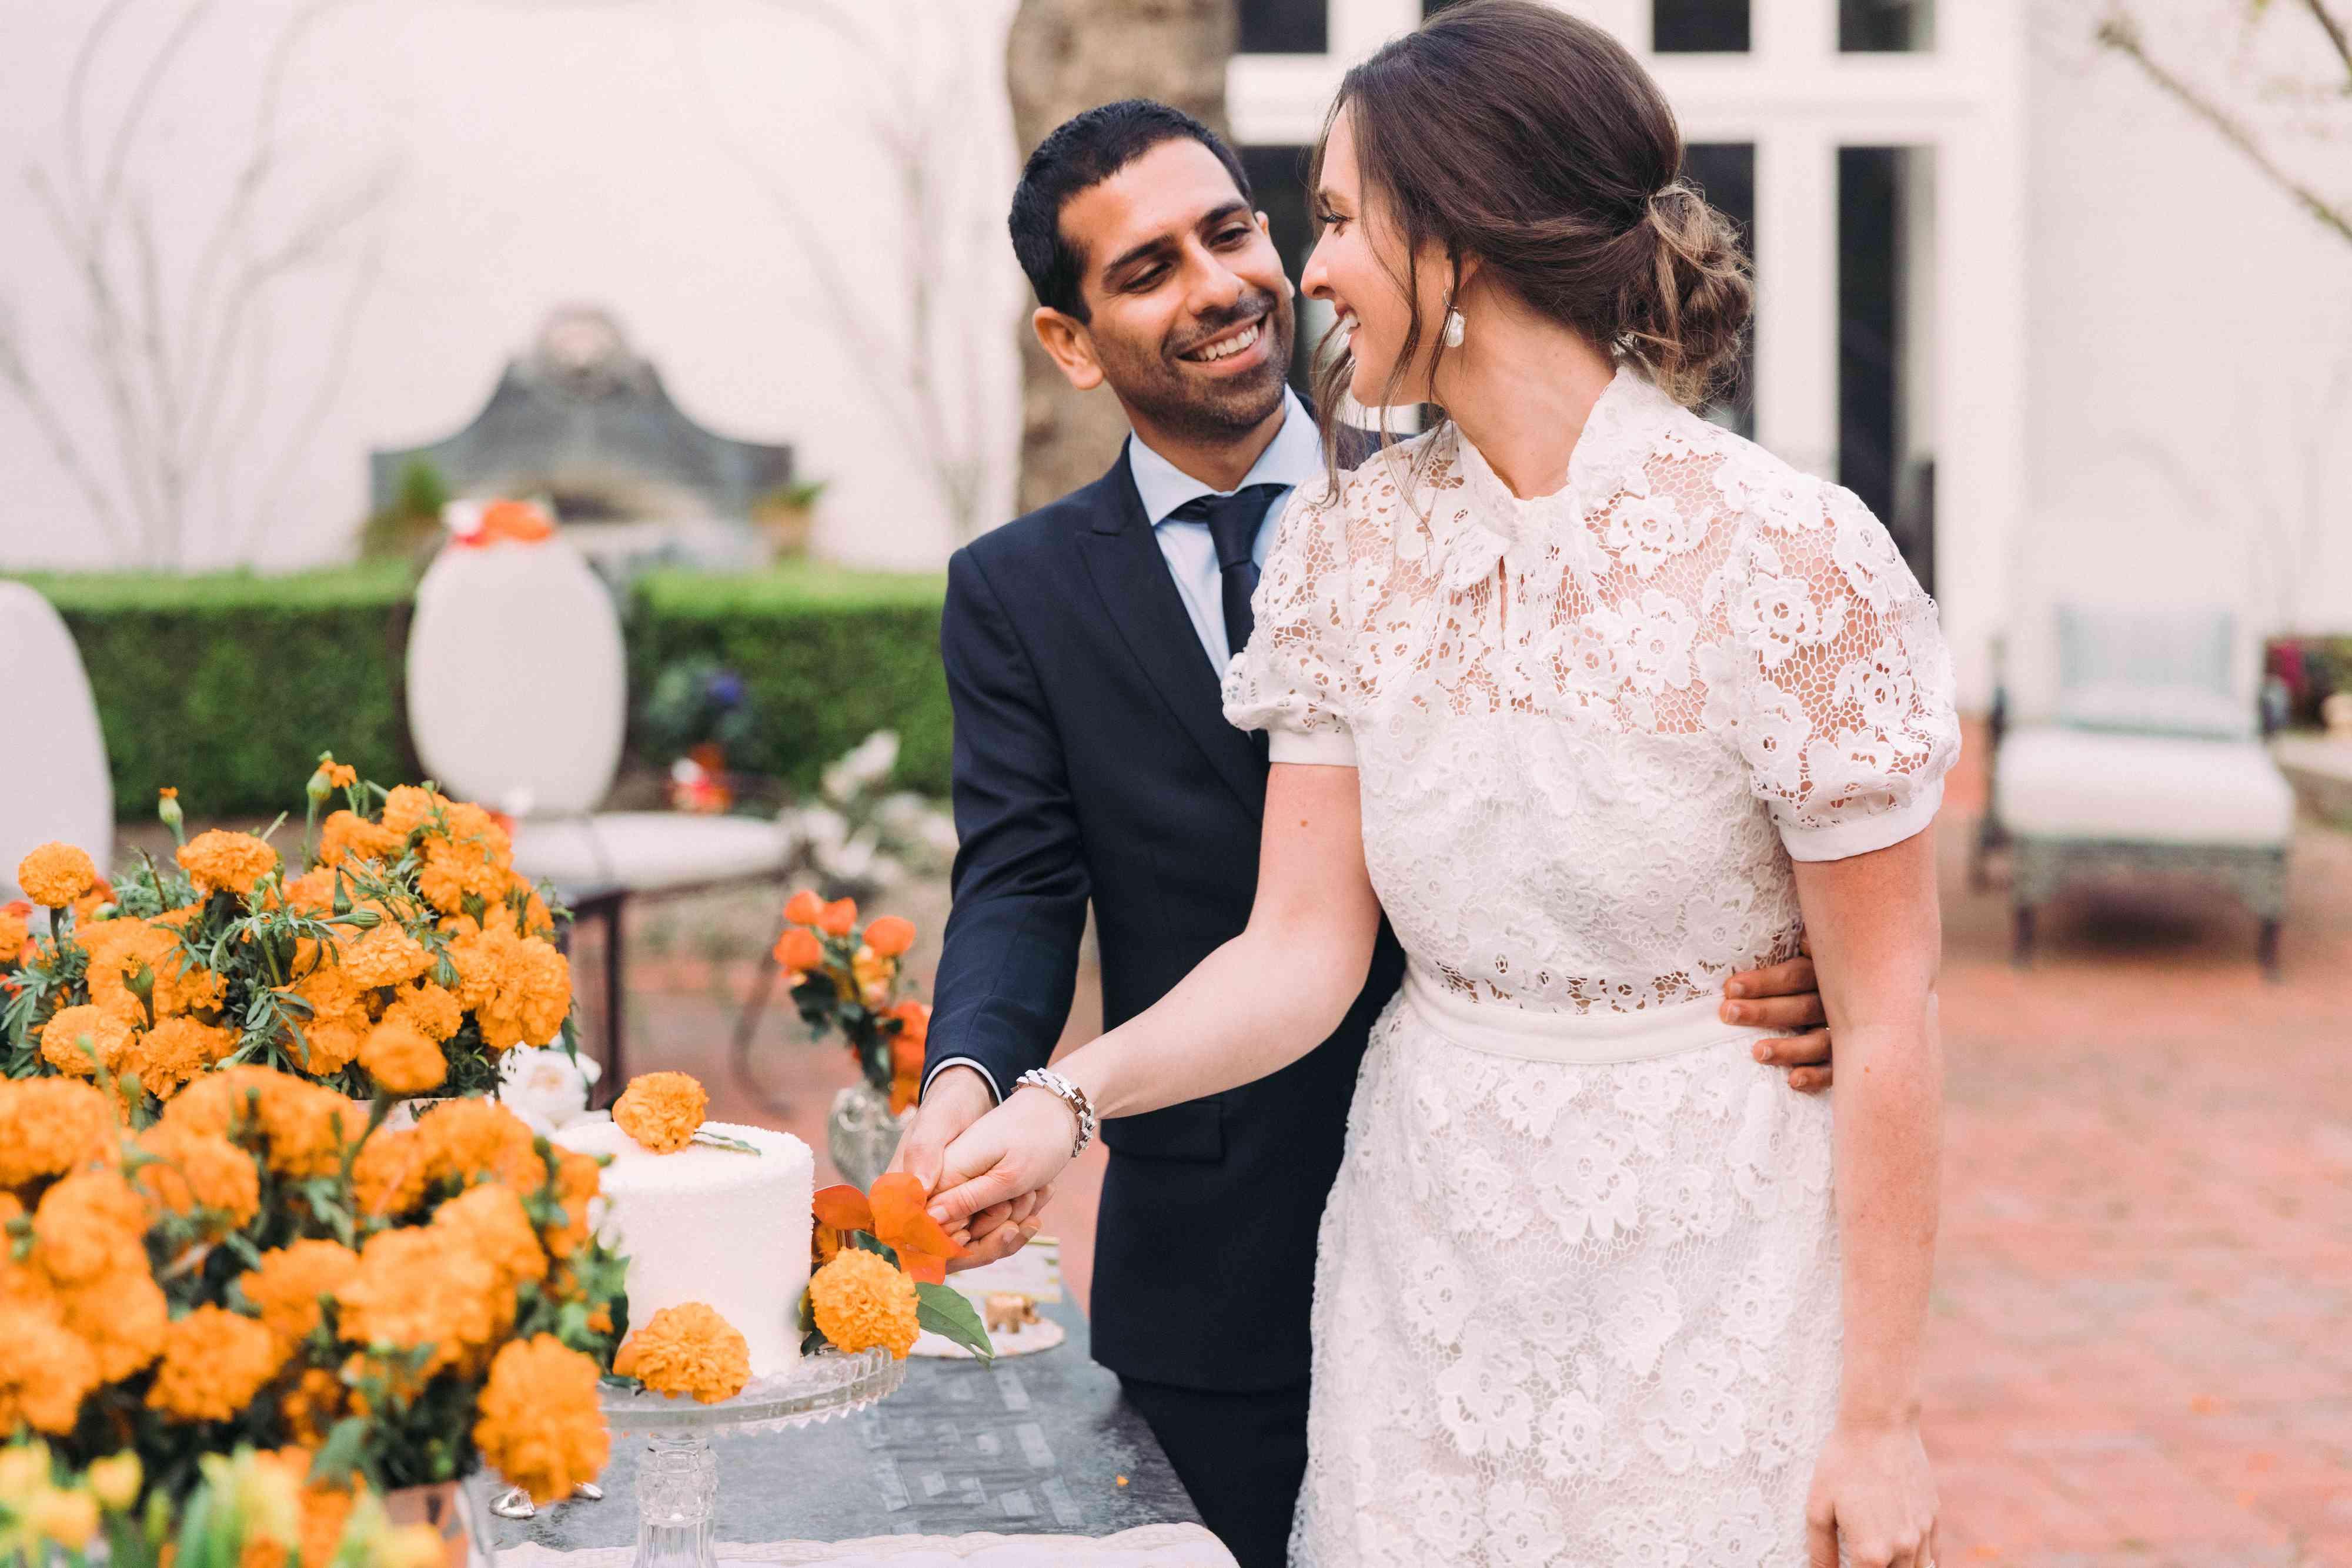 couple cutting cake